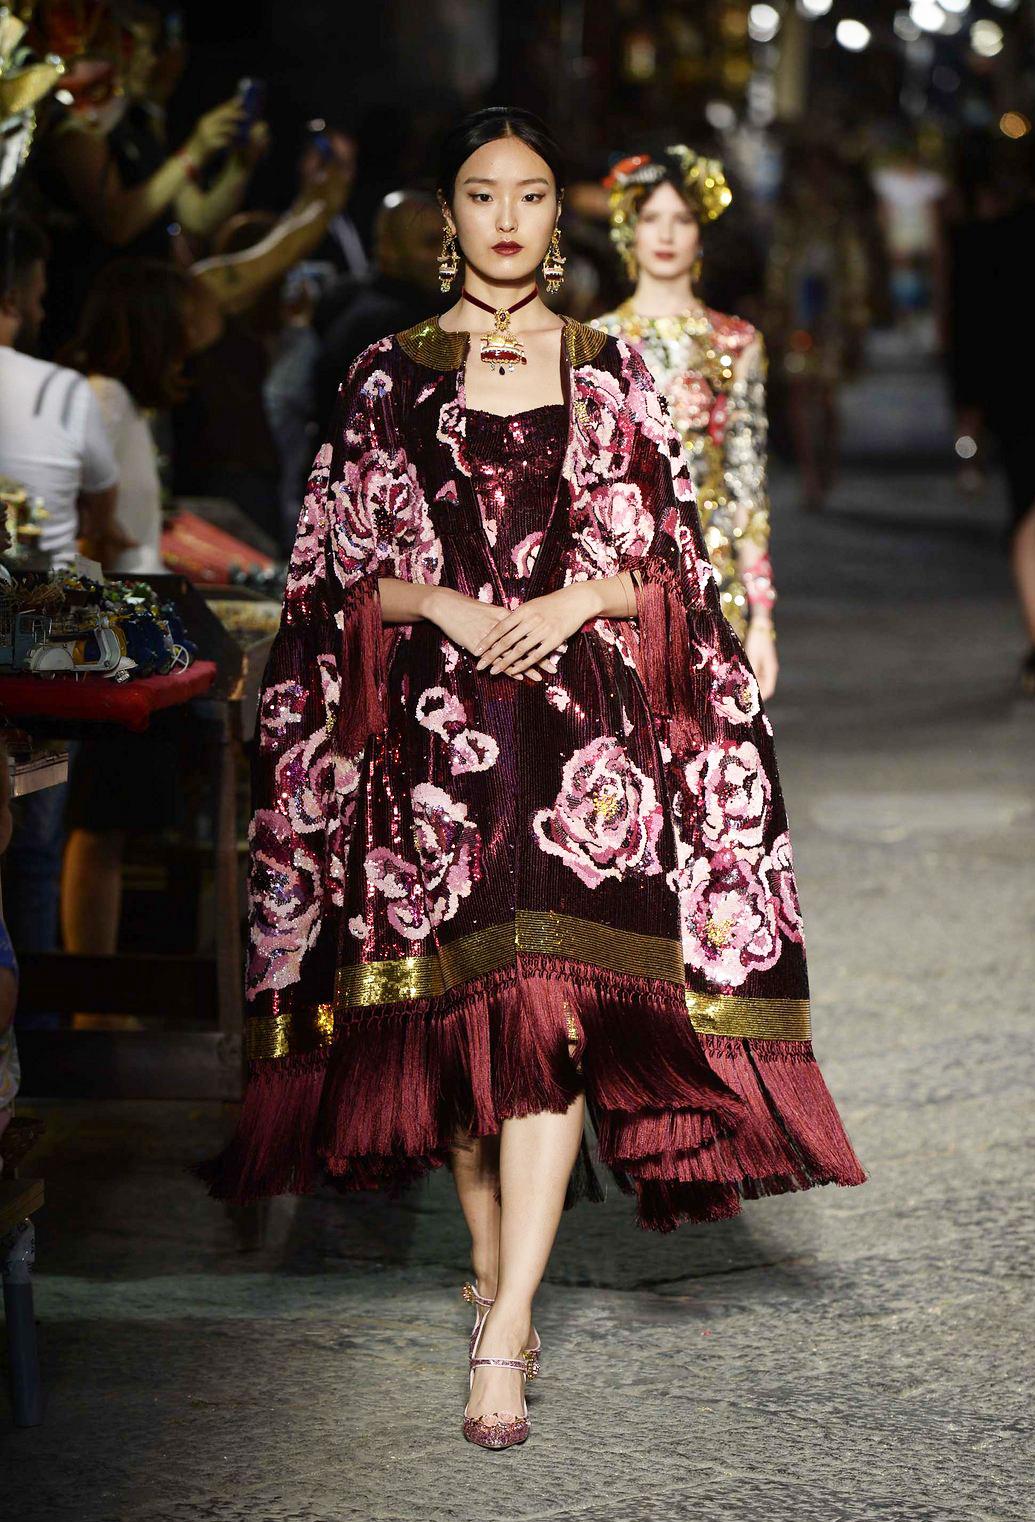 online retailer f7a8e e2aba Dolce & Gabbana Alta Moda 2016 - Fashion Trendsetter